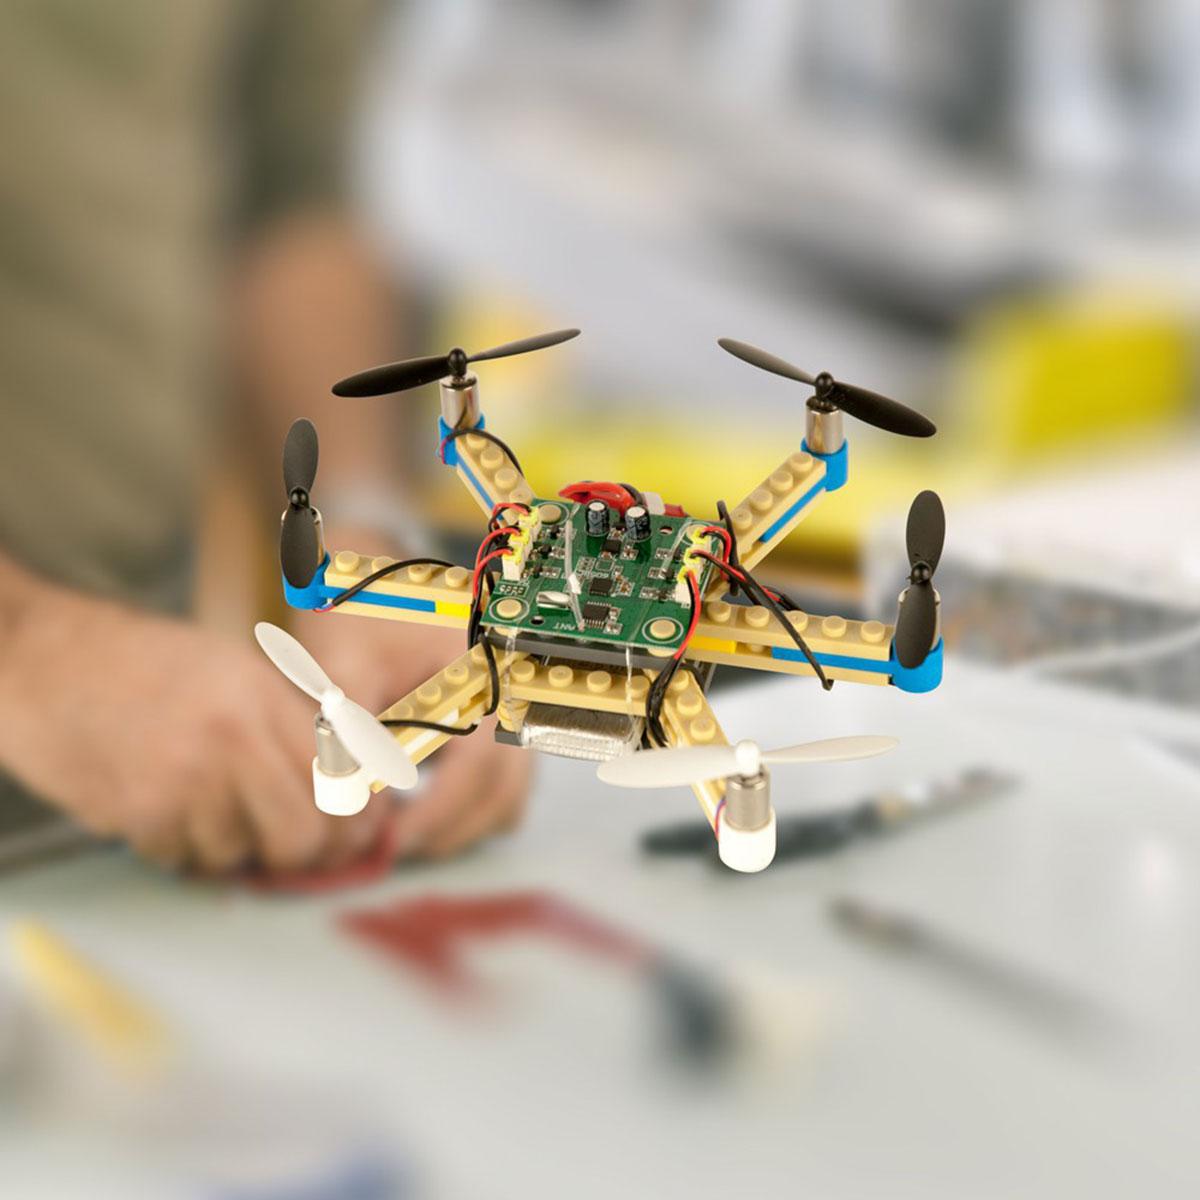 Drohnen-Mallorca-Drohnen-fliegen-Mallorca-Drohnen-Teambuilding-Mallorca-4